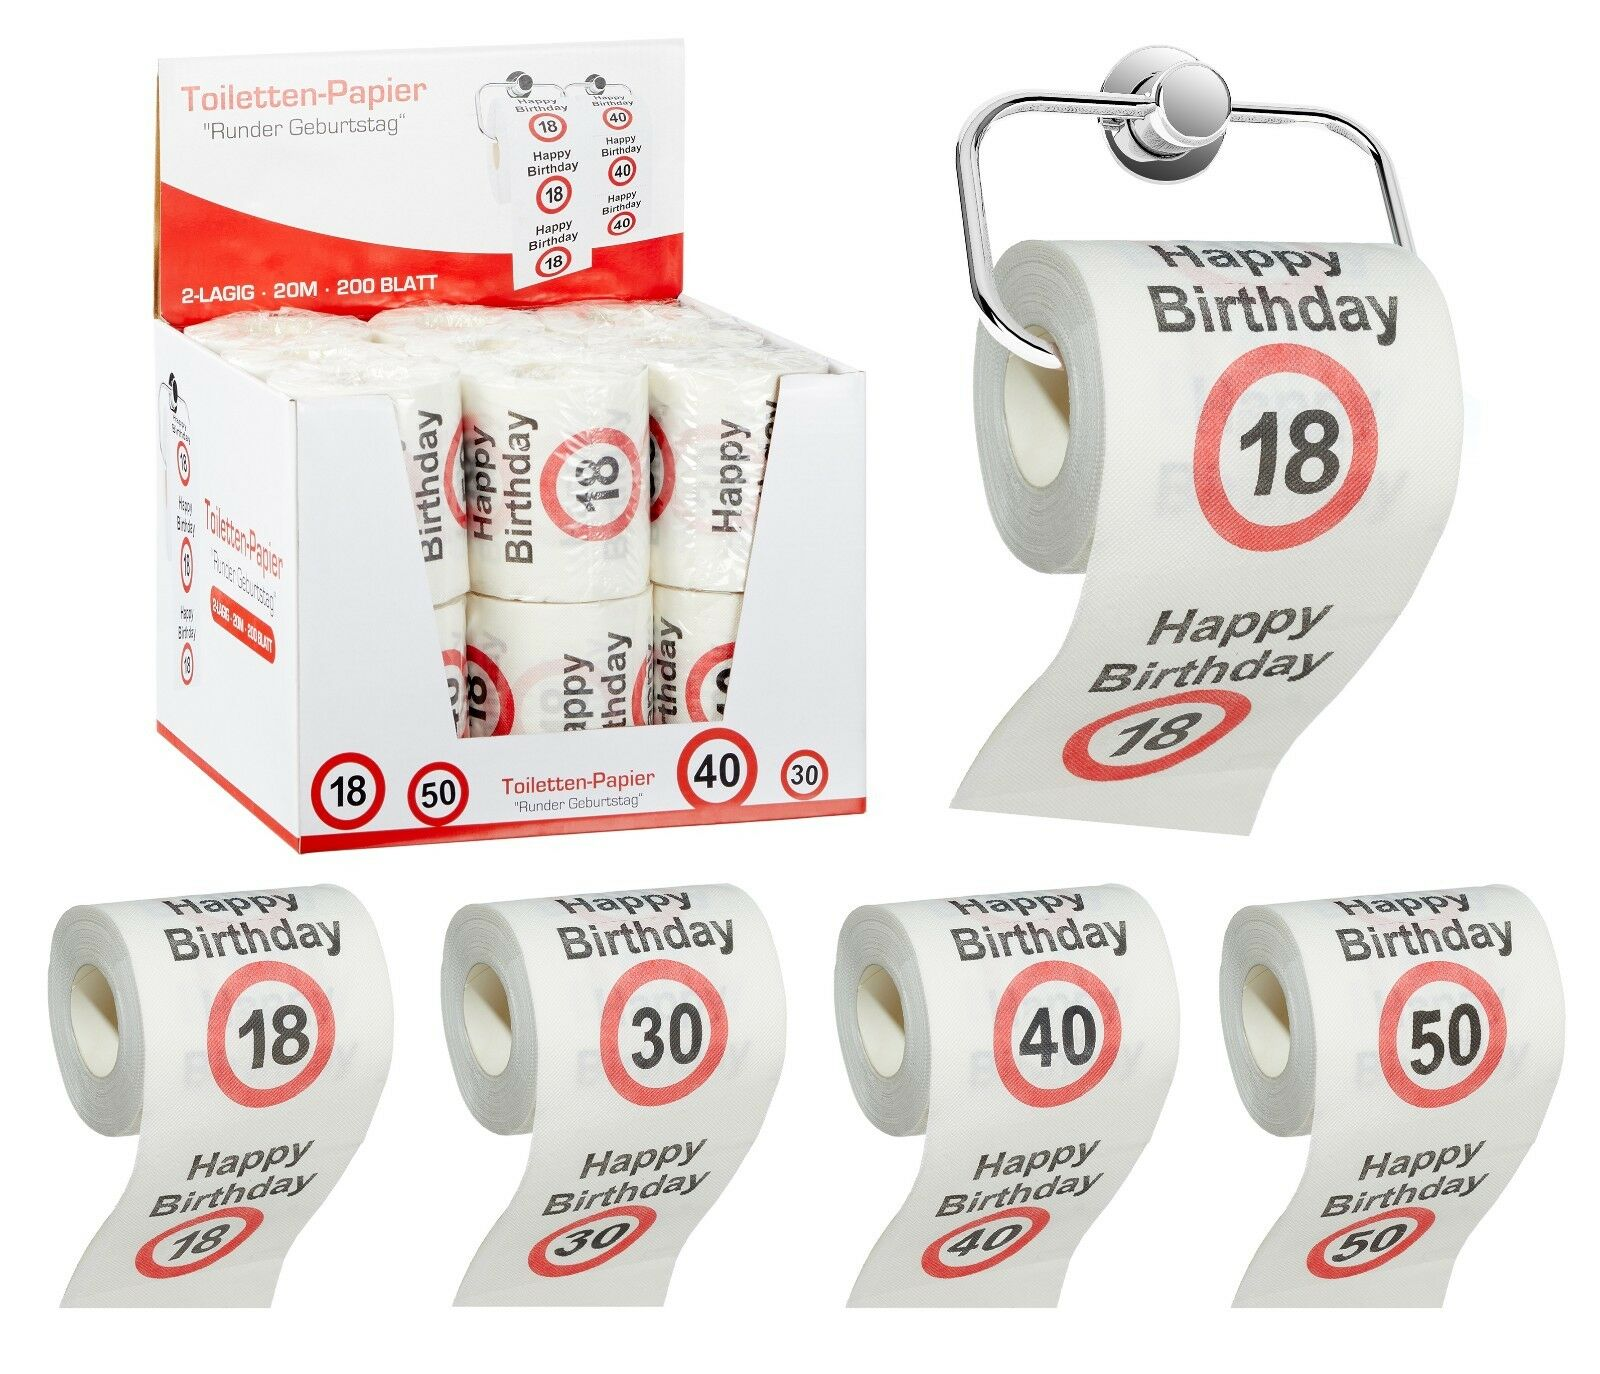 Toilettenpapier 18 30 40 50 Runder Geburtstag Geschenk Klopapier 127279813